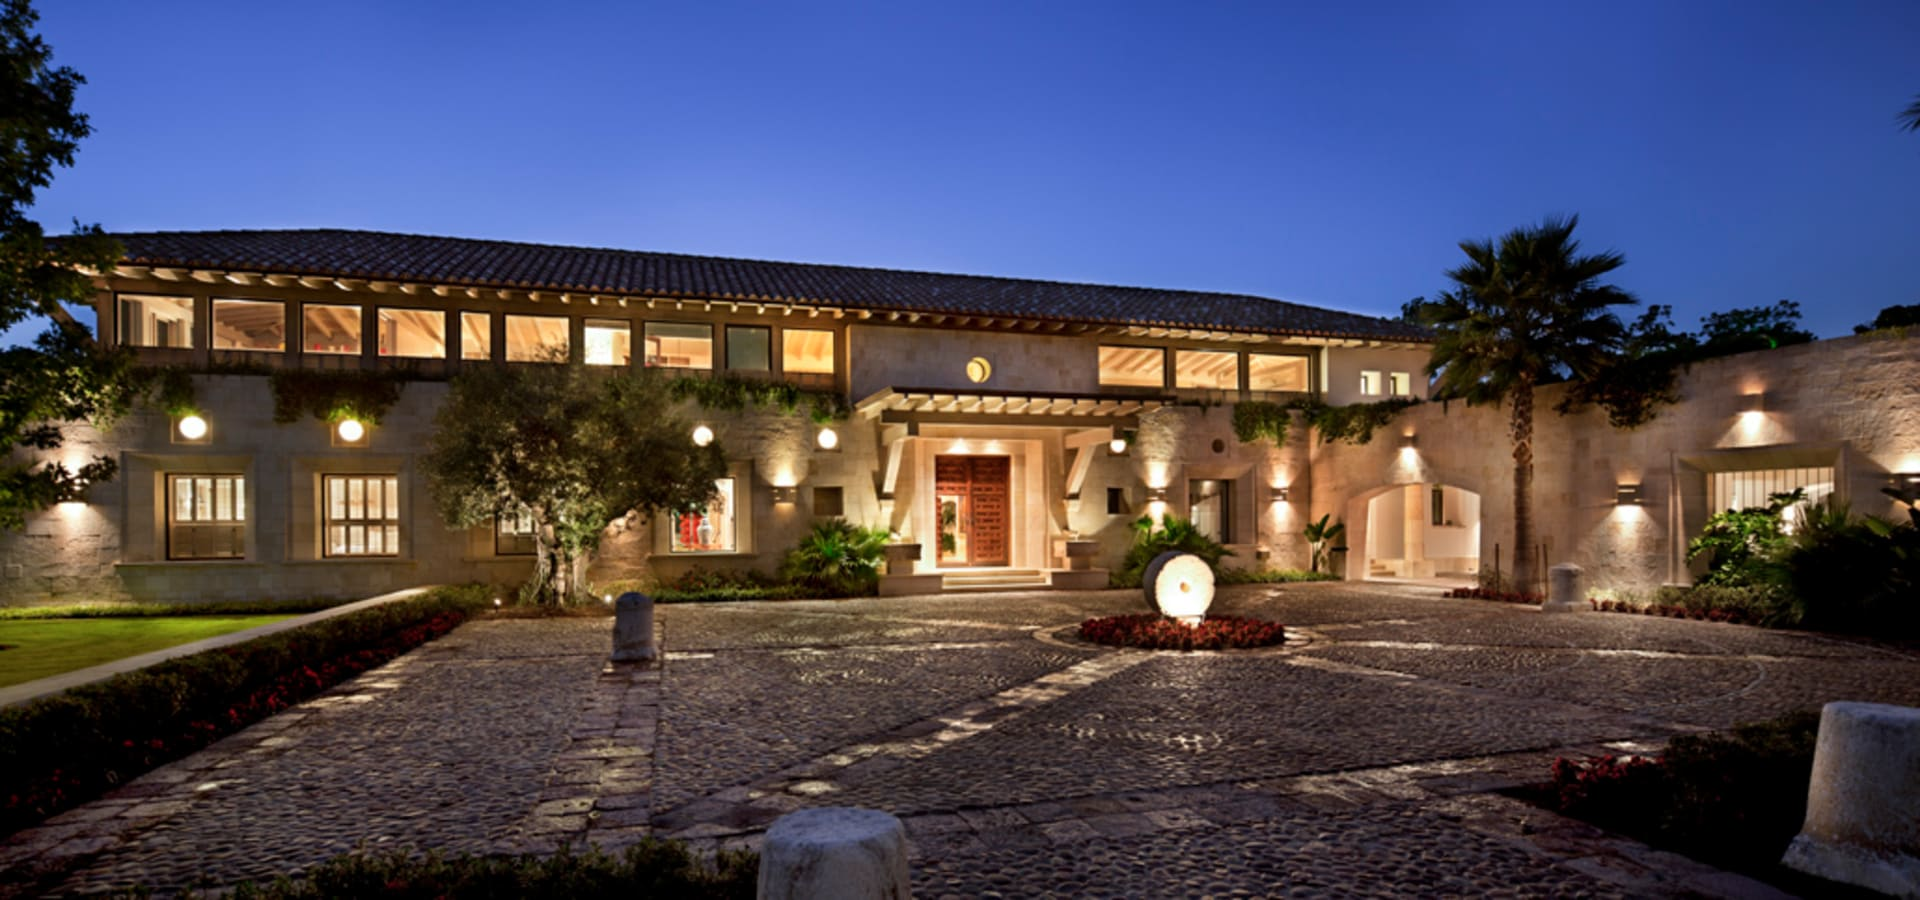 Artigas Arquitectos Mexico